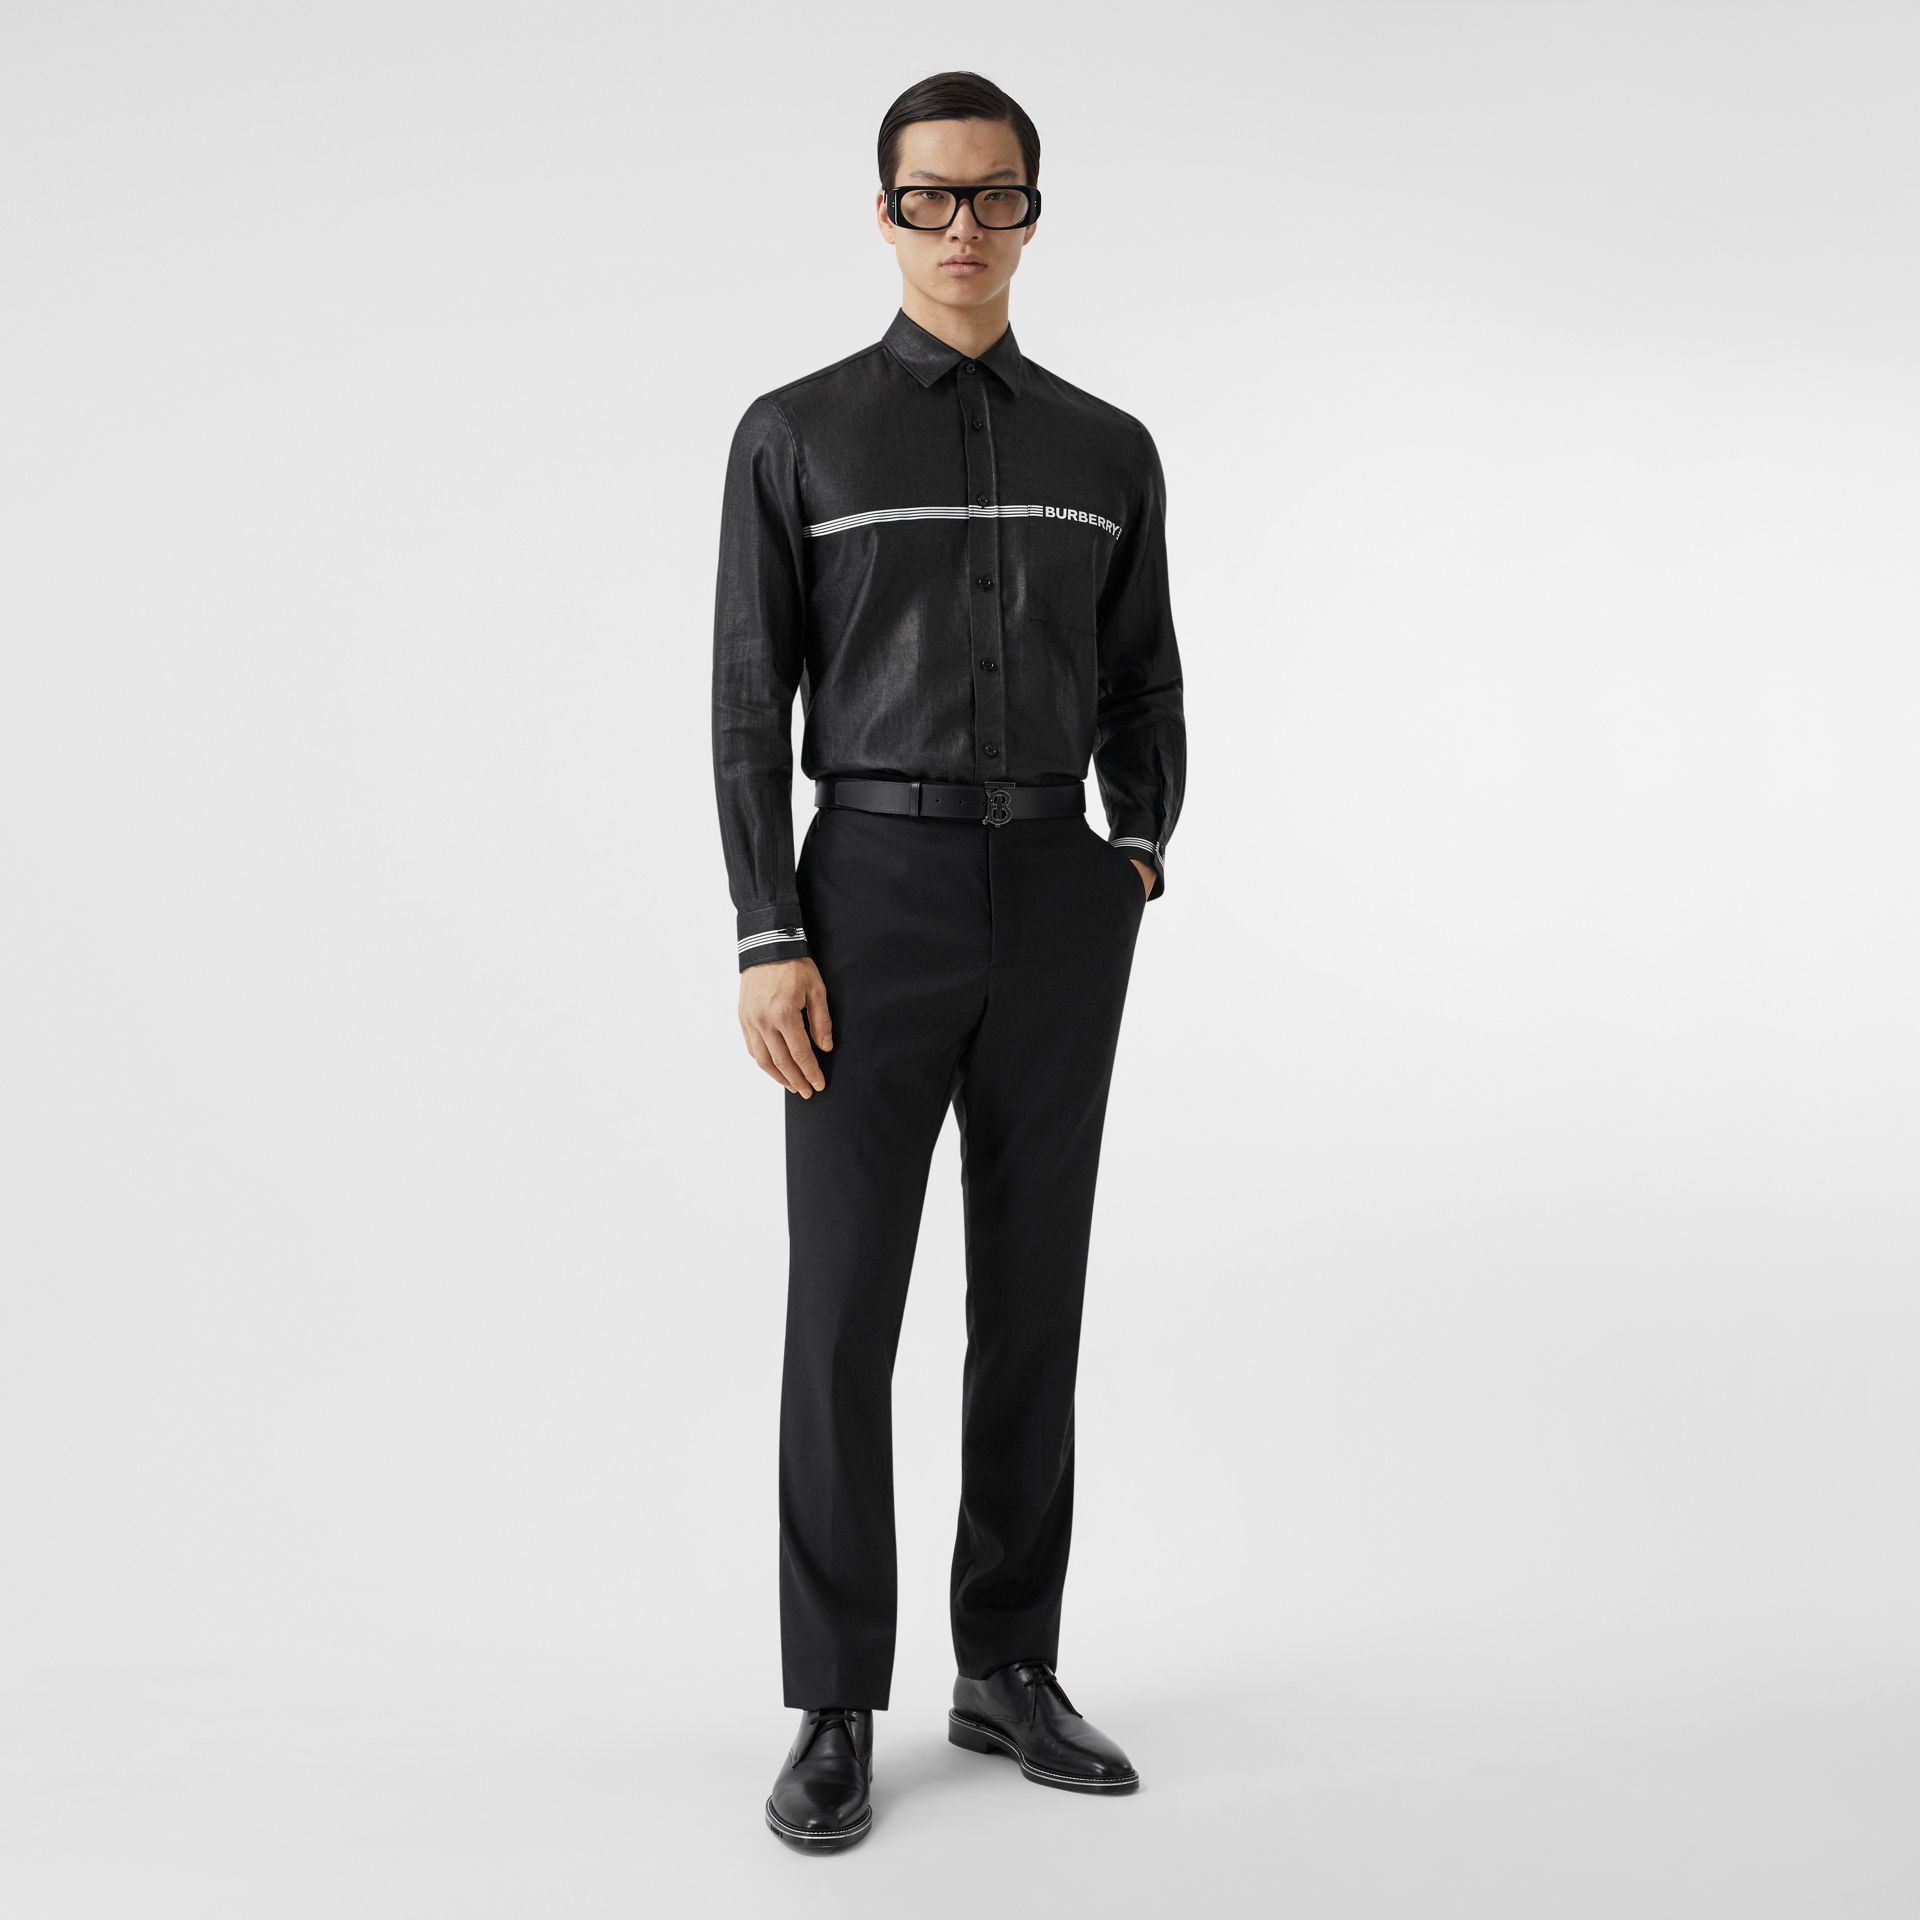 Logo Print Linen Blend Shirt in Black | Burberry - gallery image 5